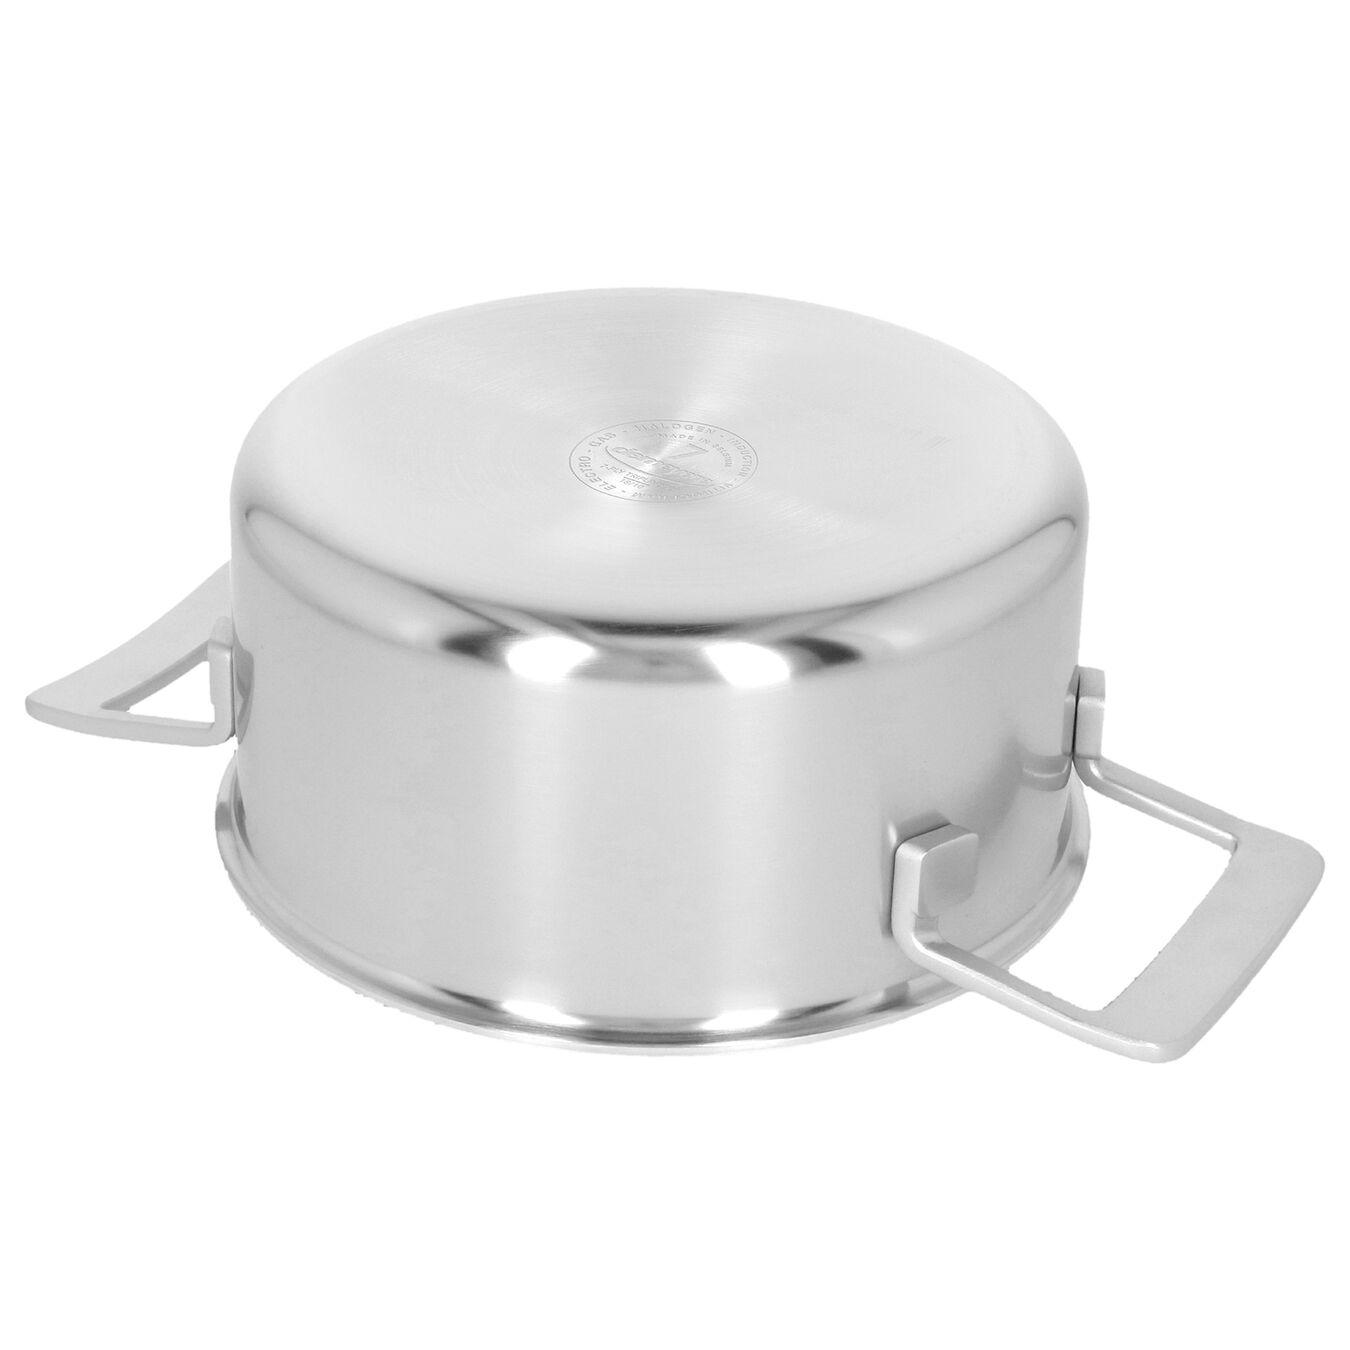 Kookpot met deksel 20 cm / 3 l,,large 5